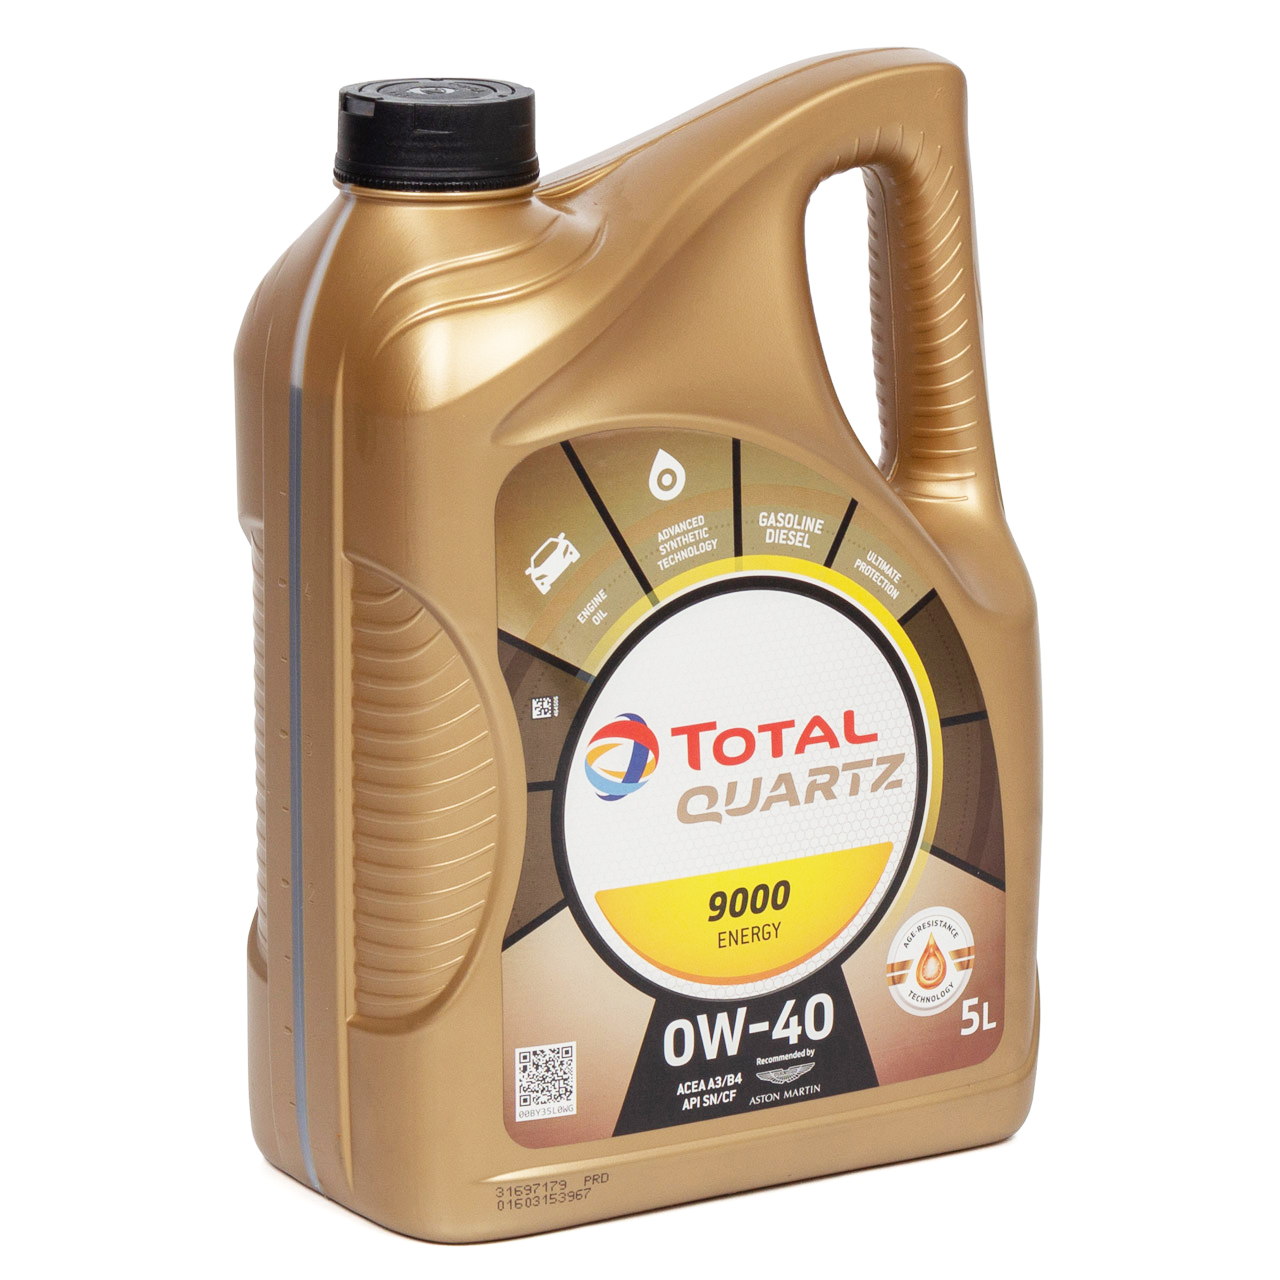 TOTAL QUARTZ 9000 ENERGY 0W40 Motoröl Öl VW 502/505.00 MB 229.5 - 5L 5 Liter